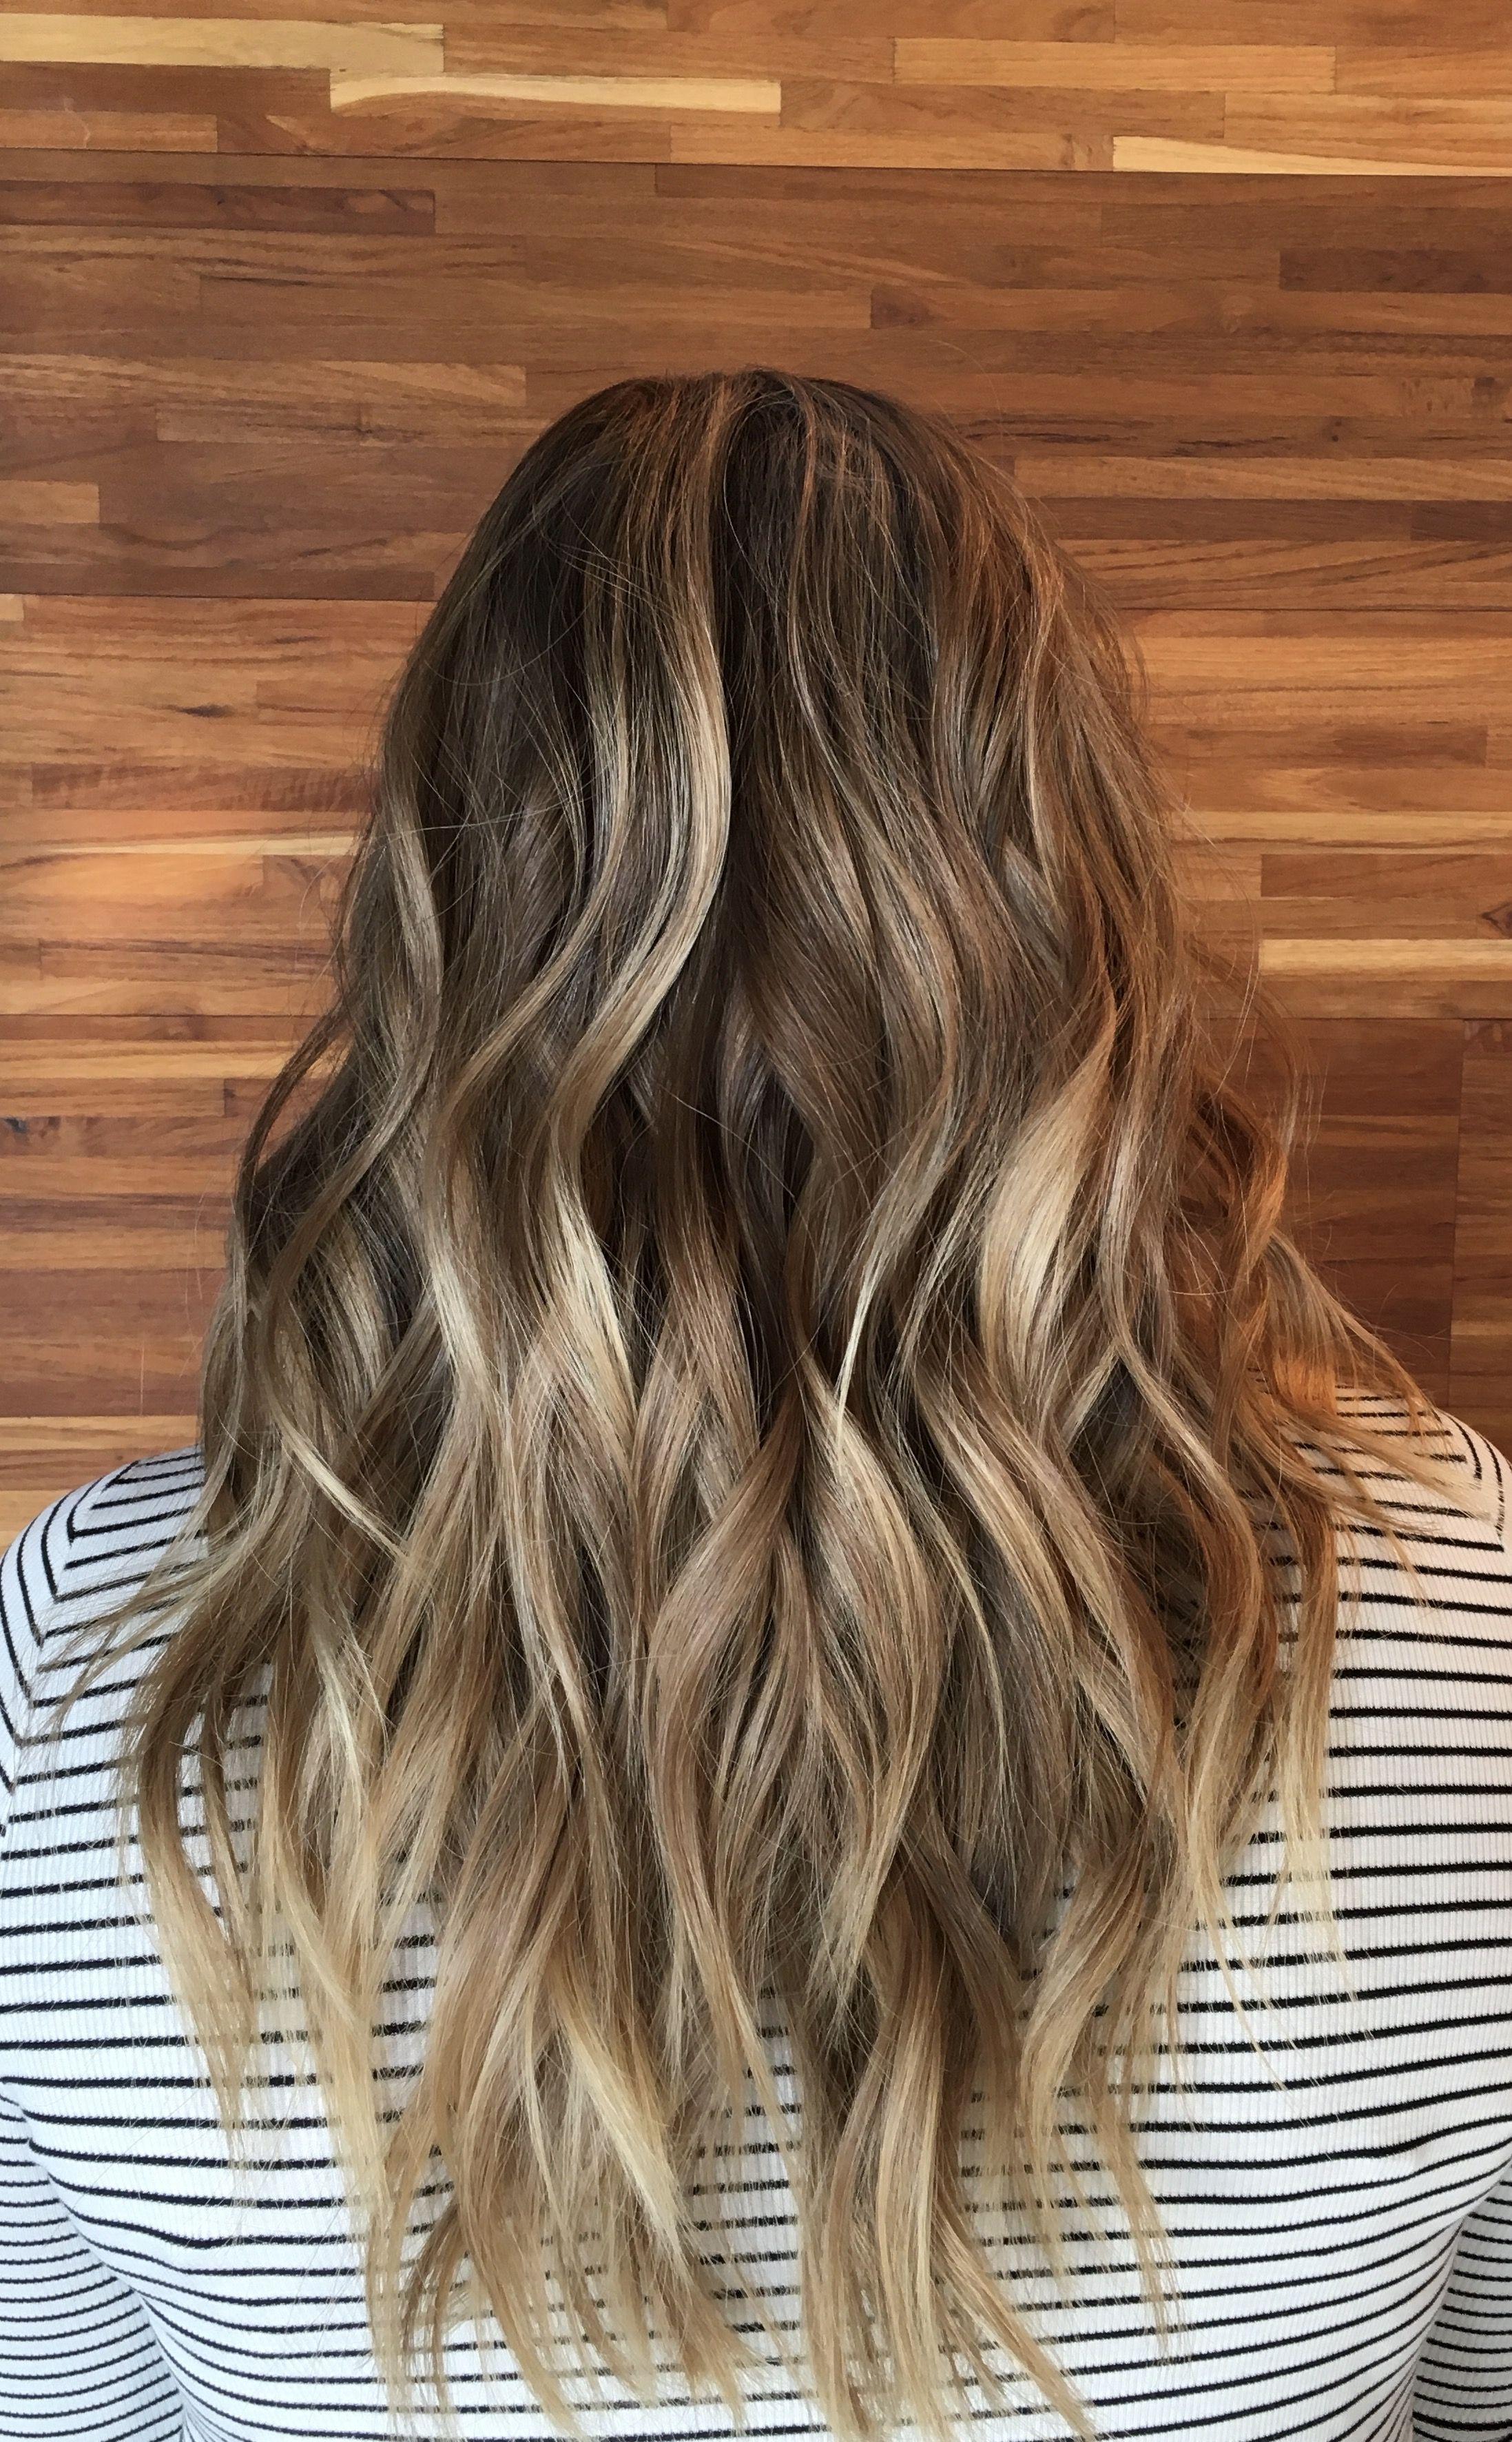 Natural warm brunette balayage hair color hair ideas pinterest